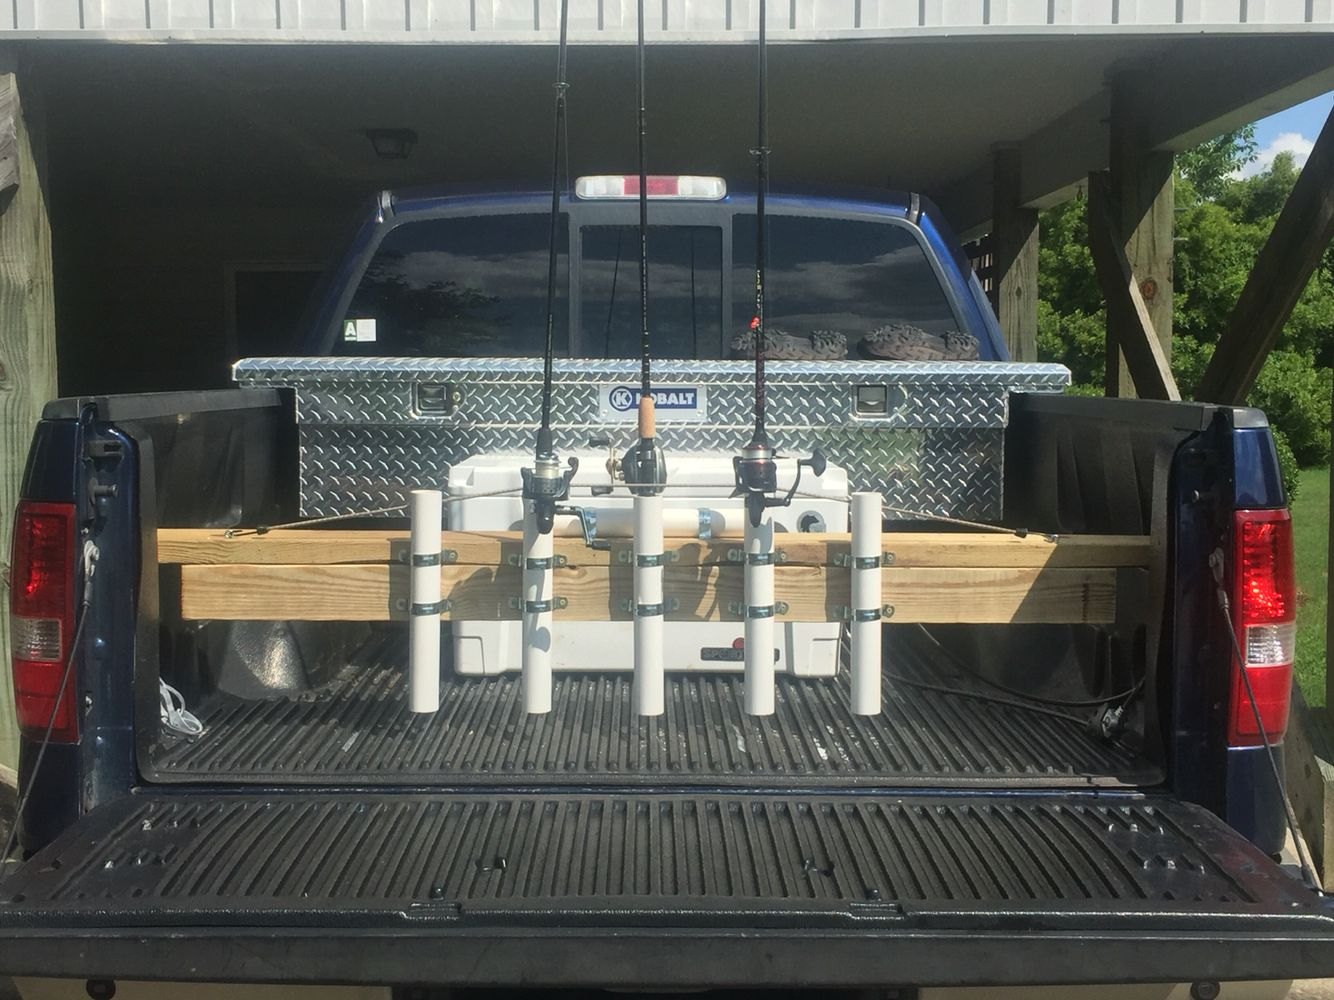 Diy truck bed fishing rod rack holder fishing hacks for Truck bed fishing rod holder